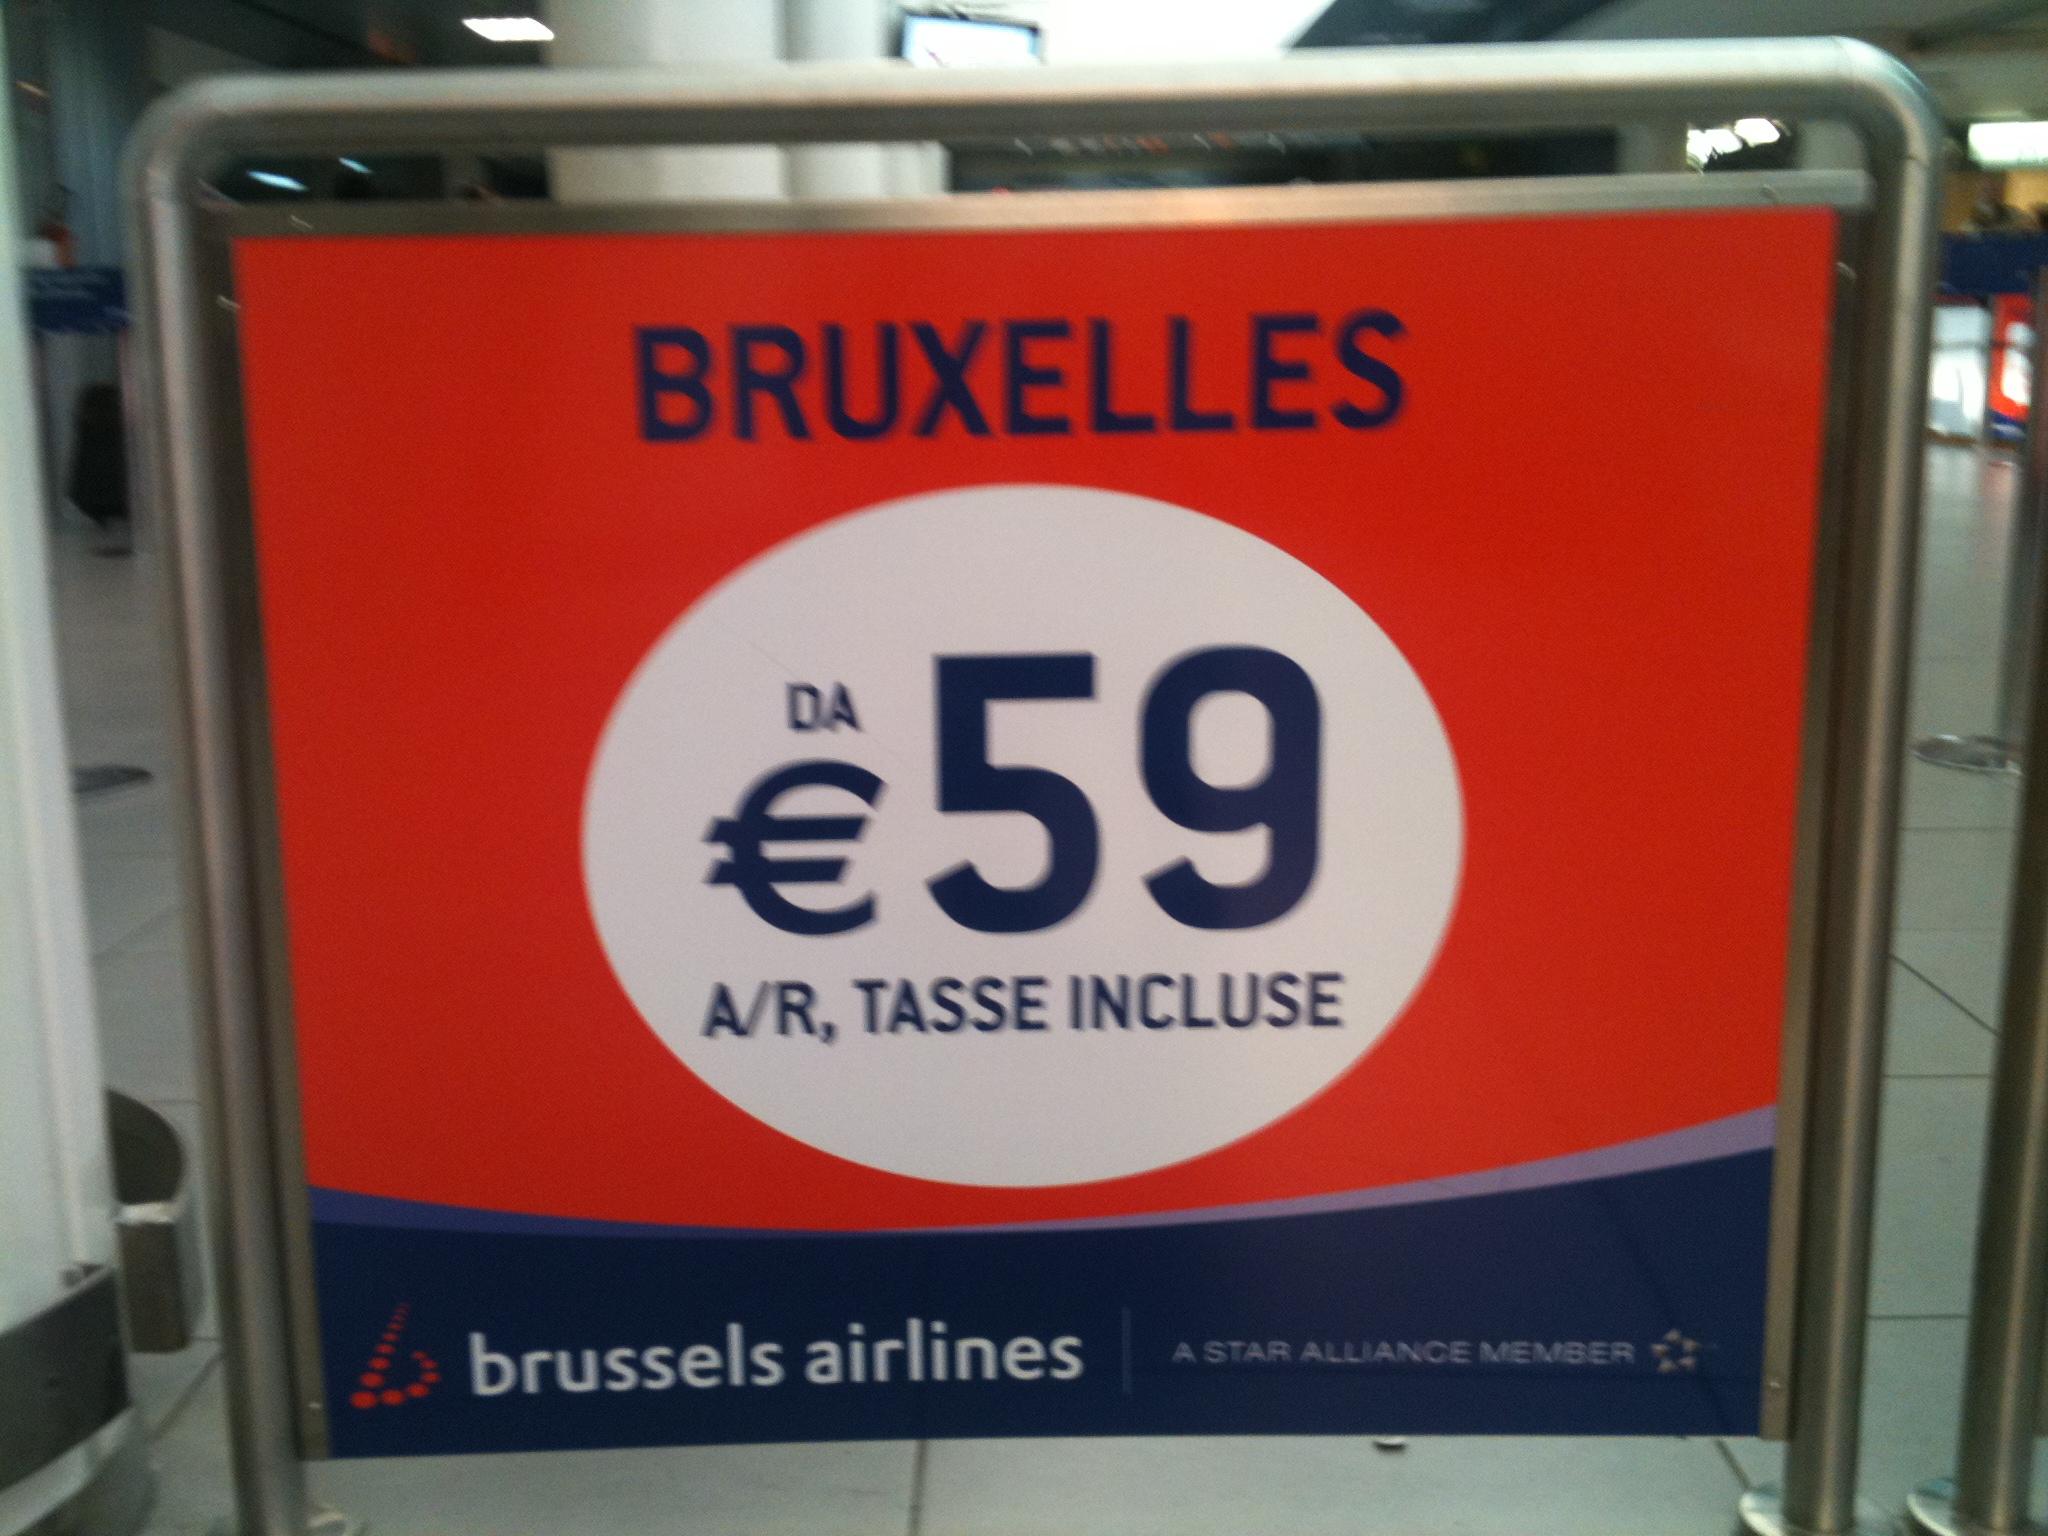 SN Brussels Airlines wants Ryanair's customers